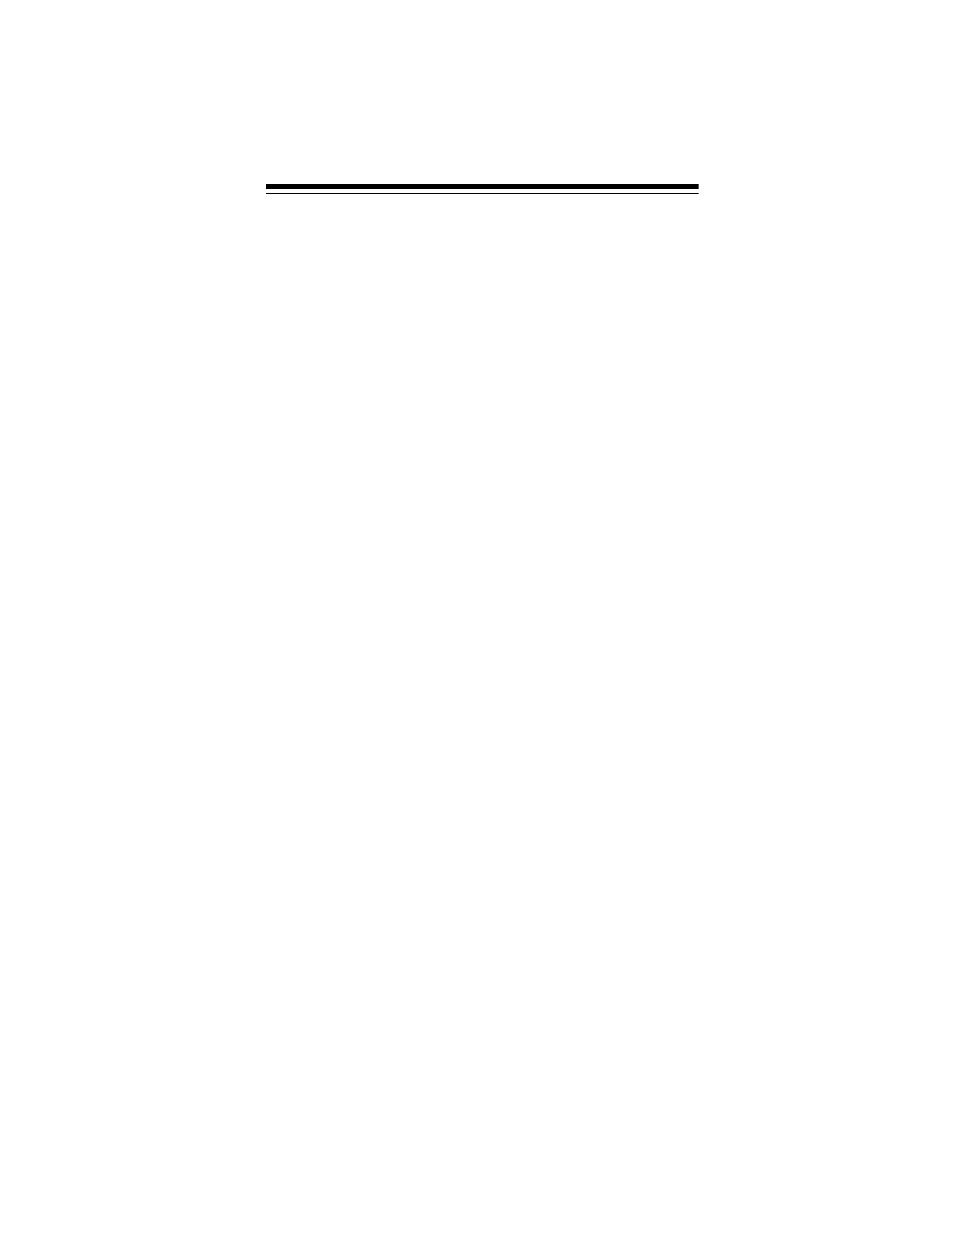 Radio Shack PRO-89 User Manual | Page 3 / 64